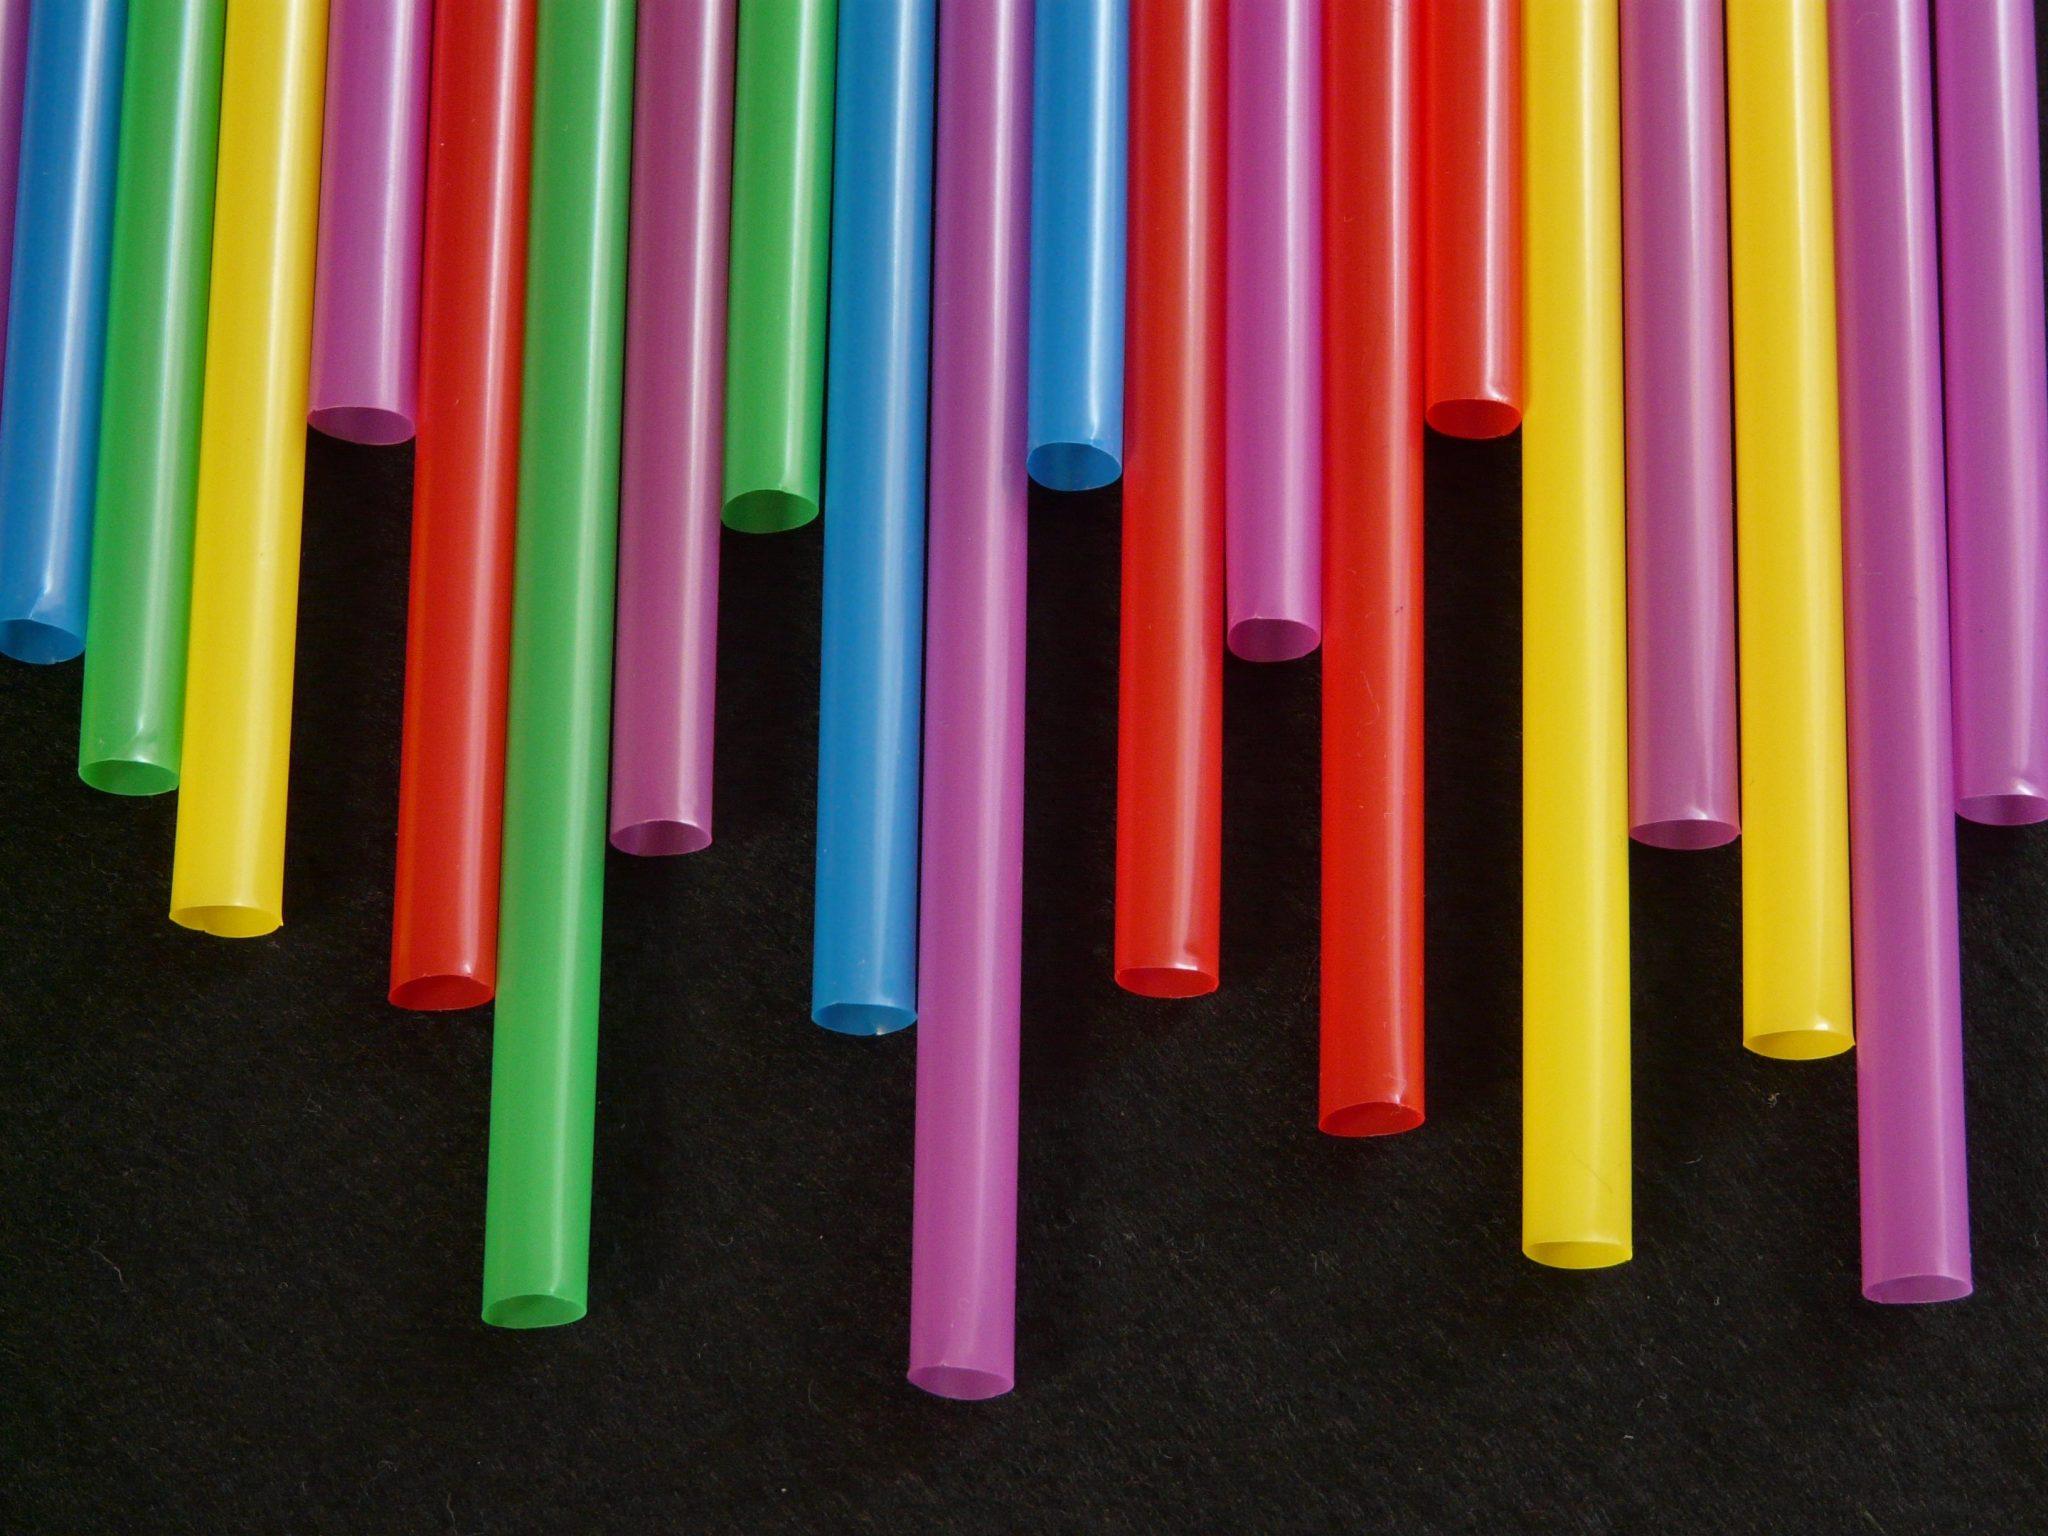 Opinion: Single Use Plastics Directive Does Not Threaten Internal Market